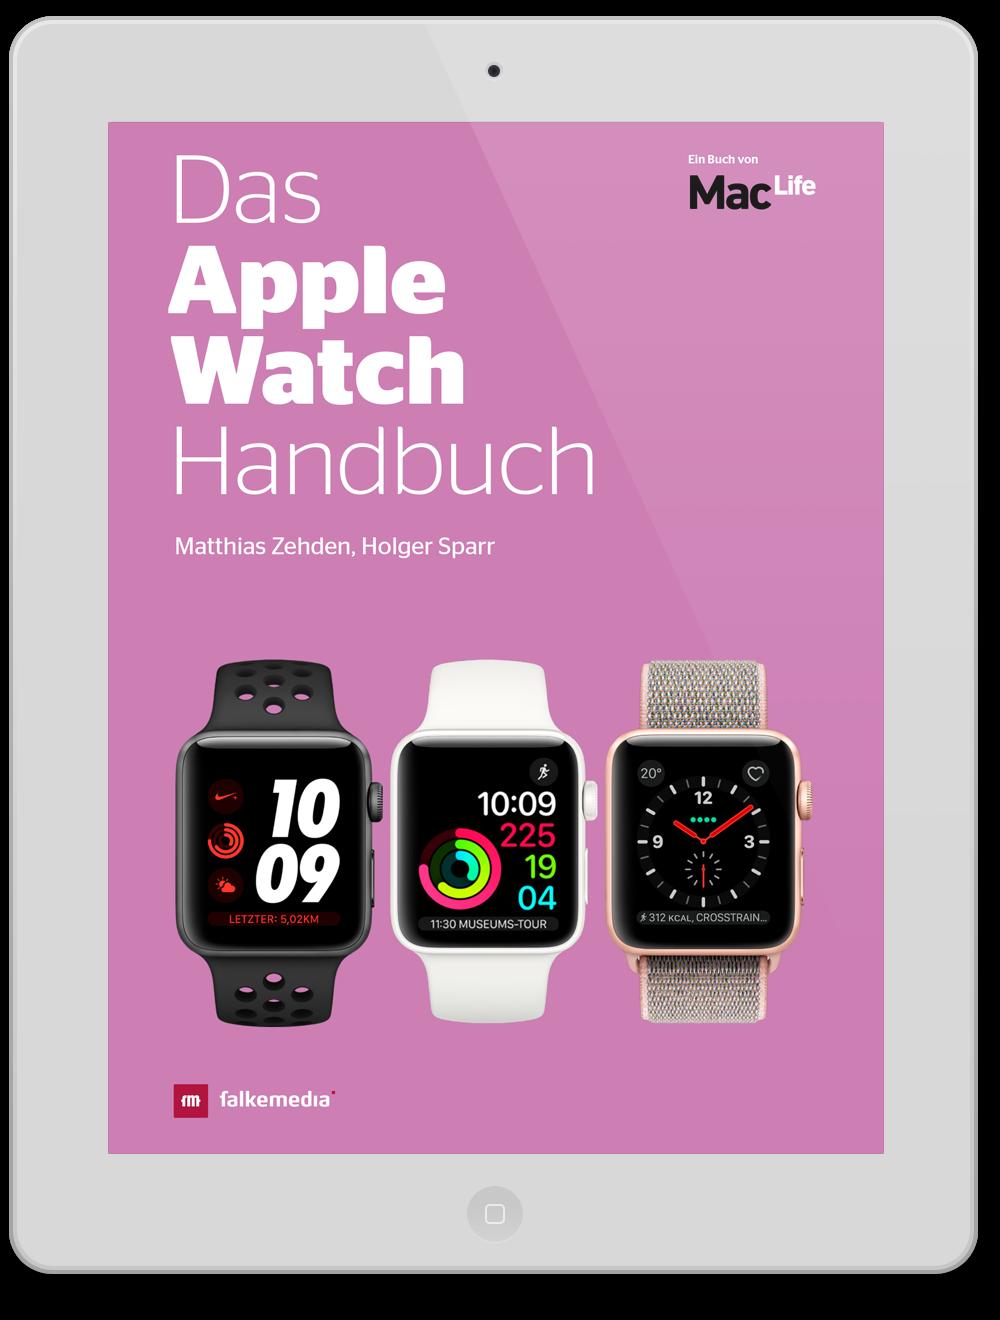 Maclife - Apple Watch Handbuch 2018